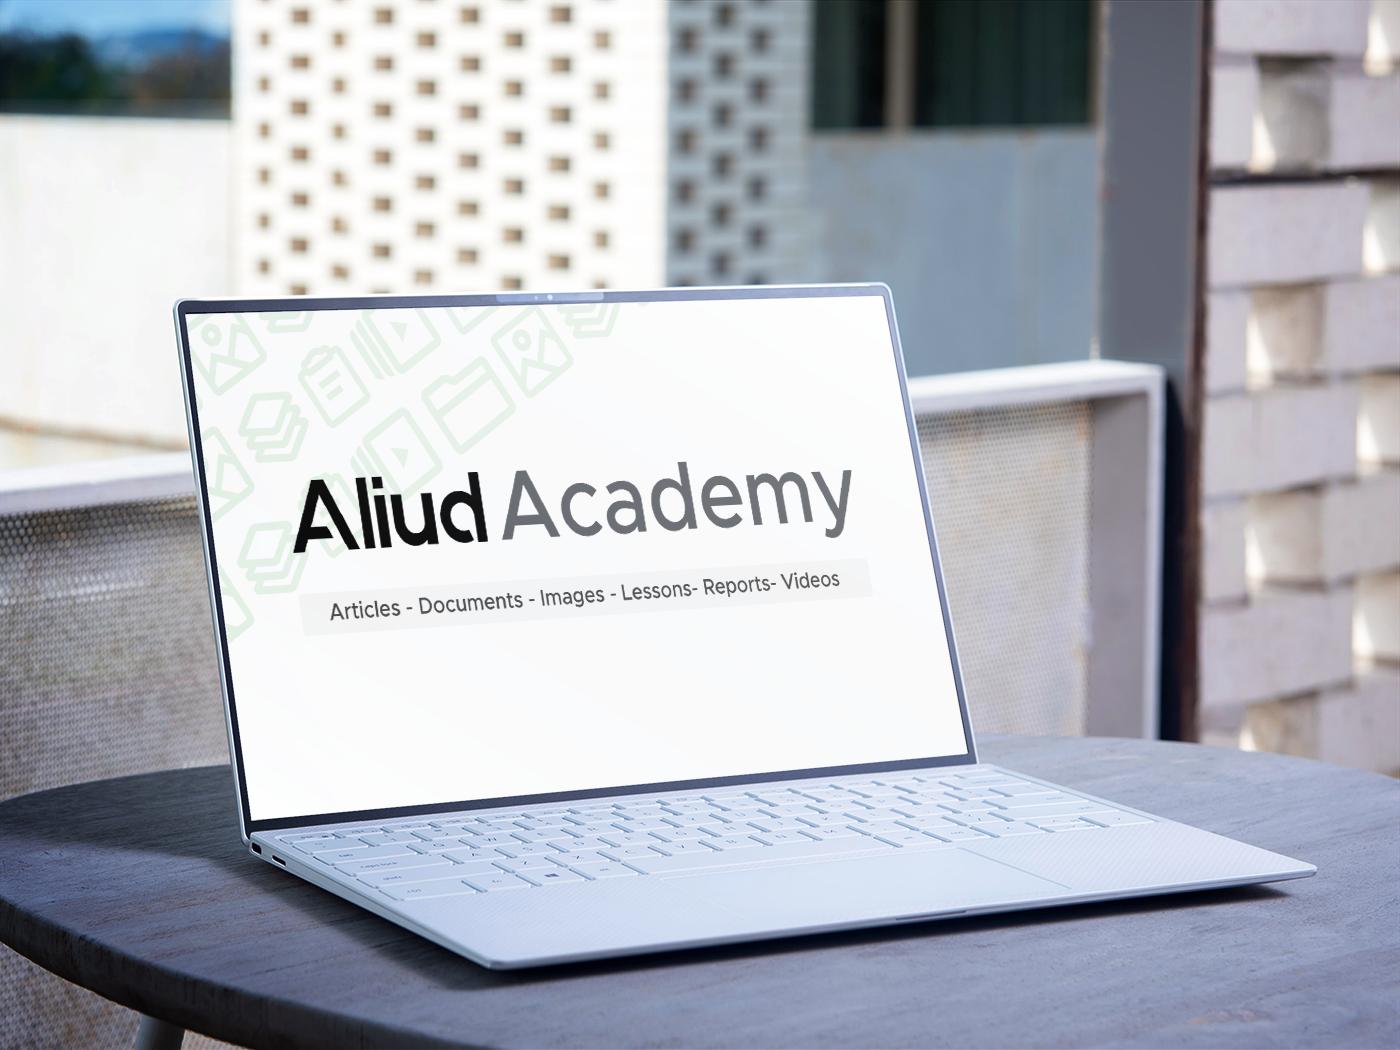 Aliud team member featured content on Aliud Academy